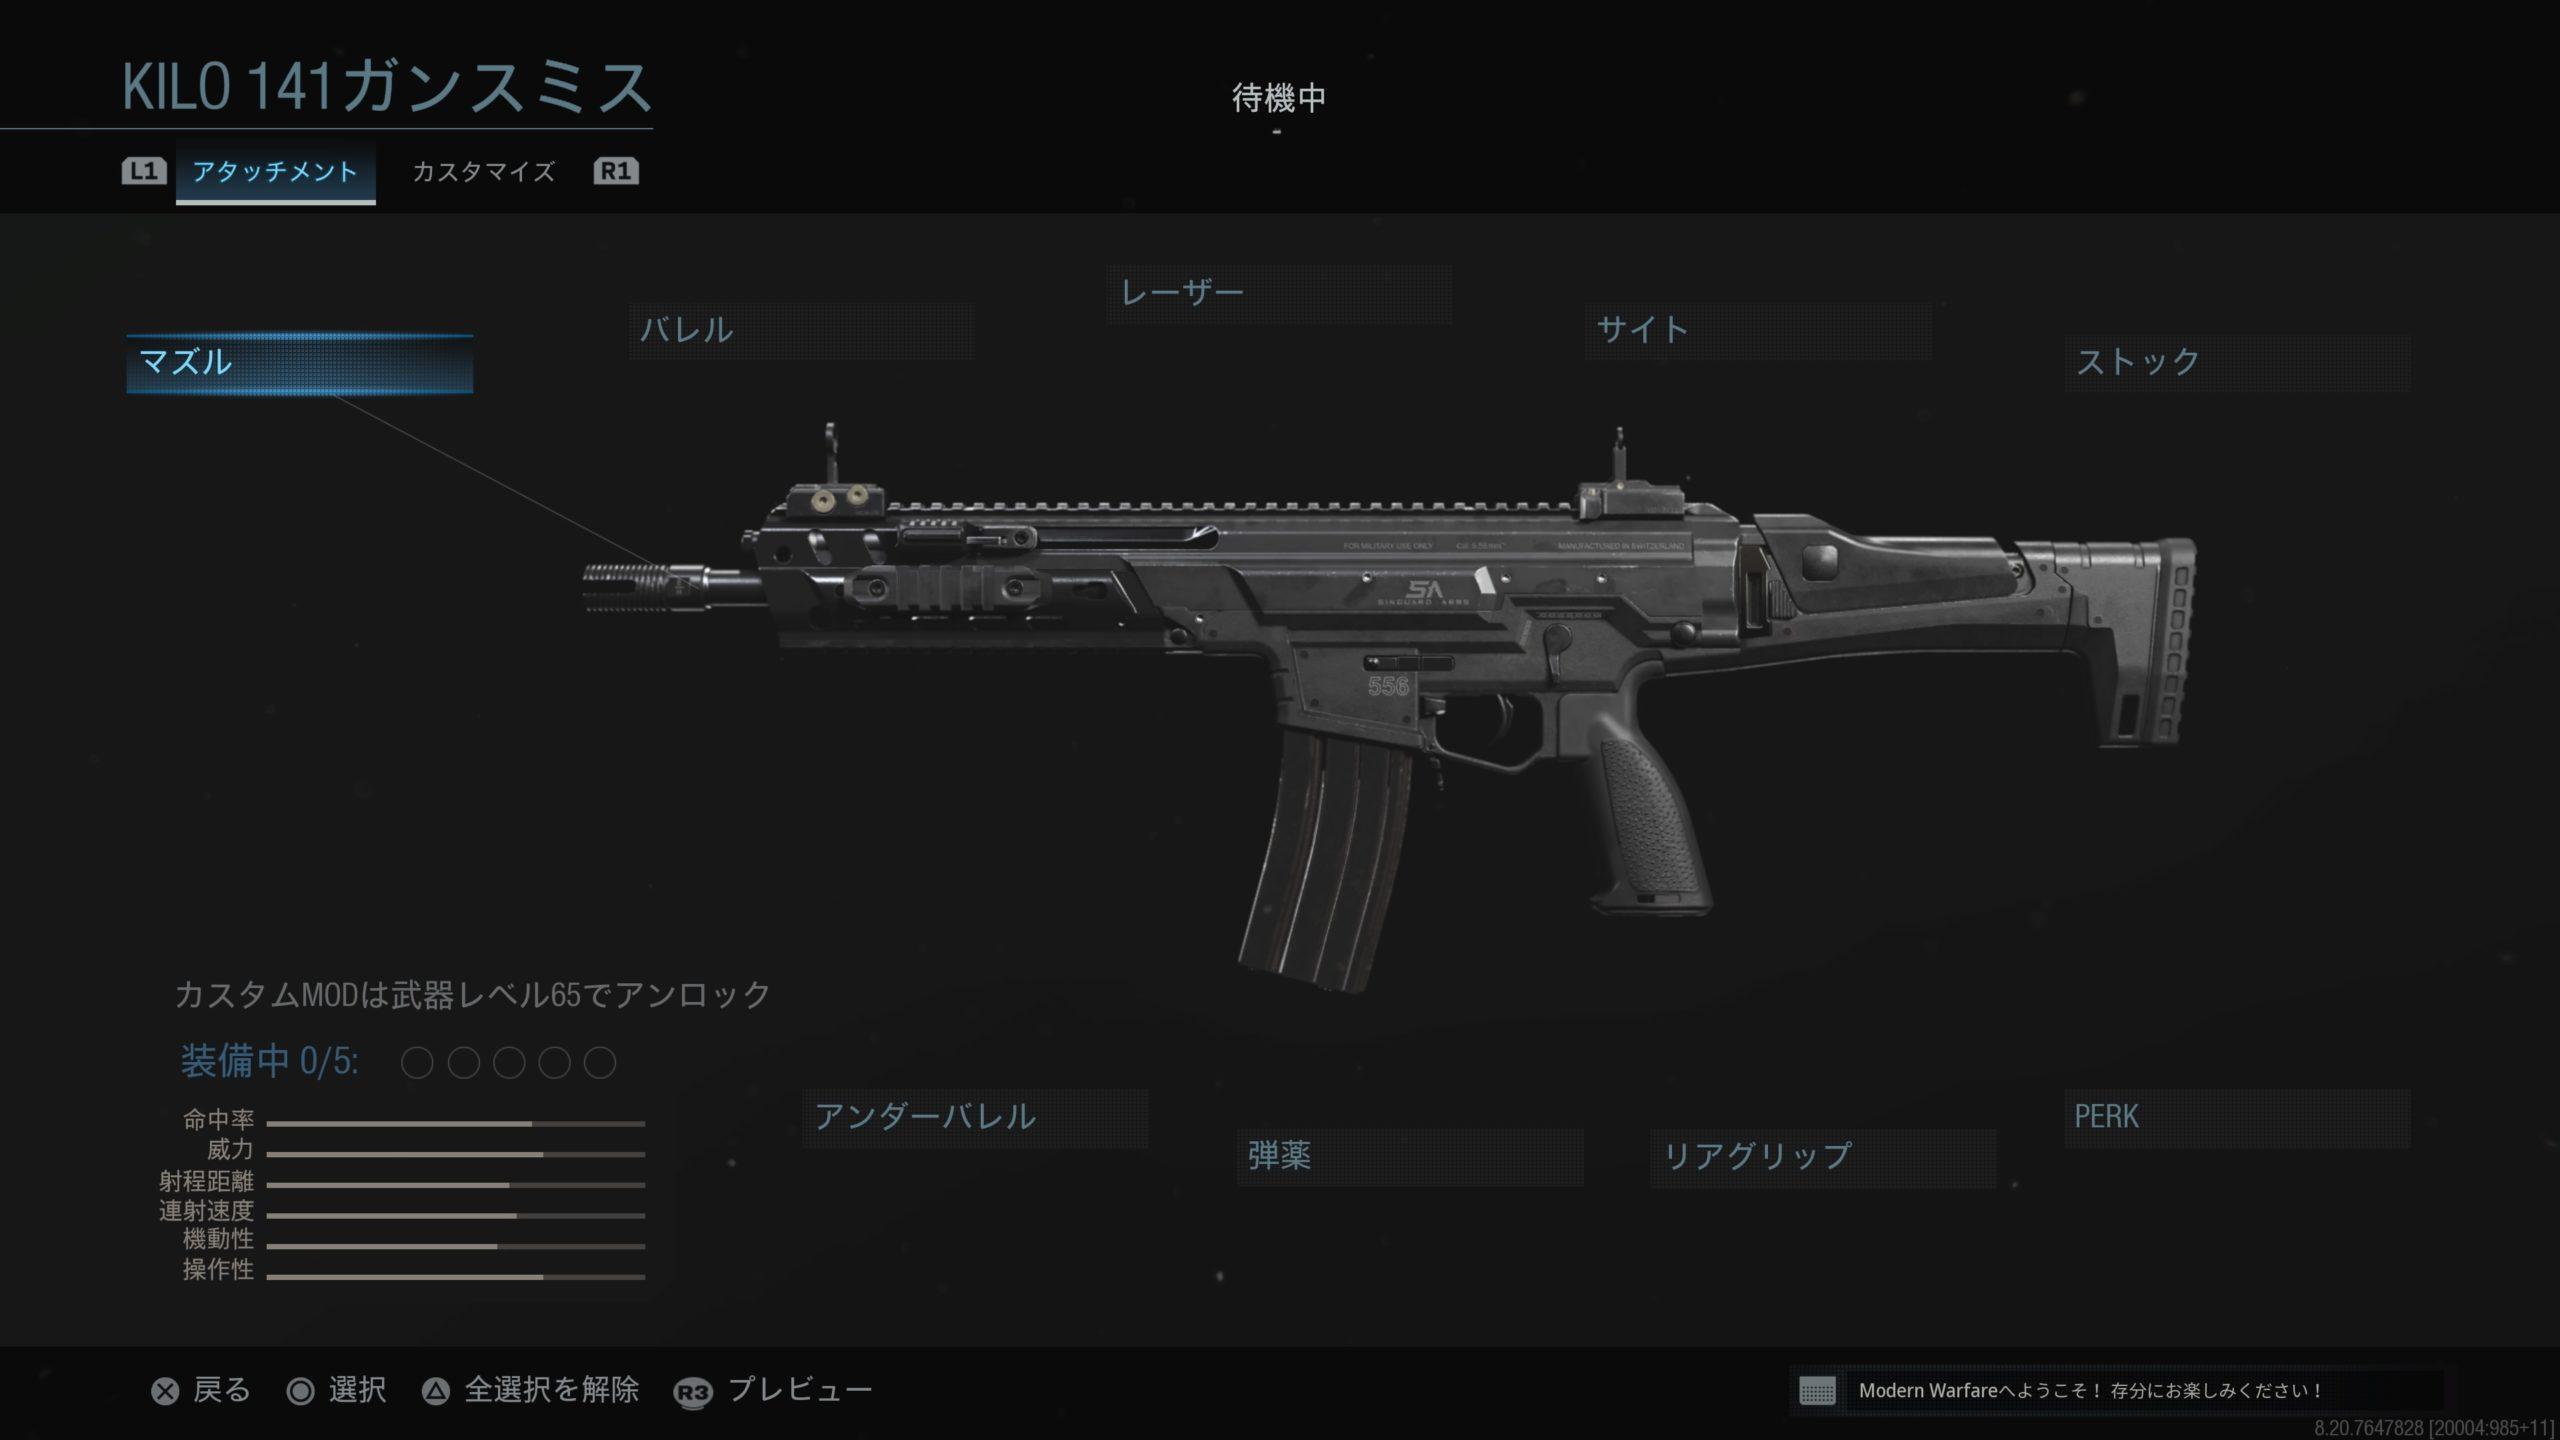 Kilo-141-gunsmith